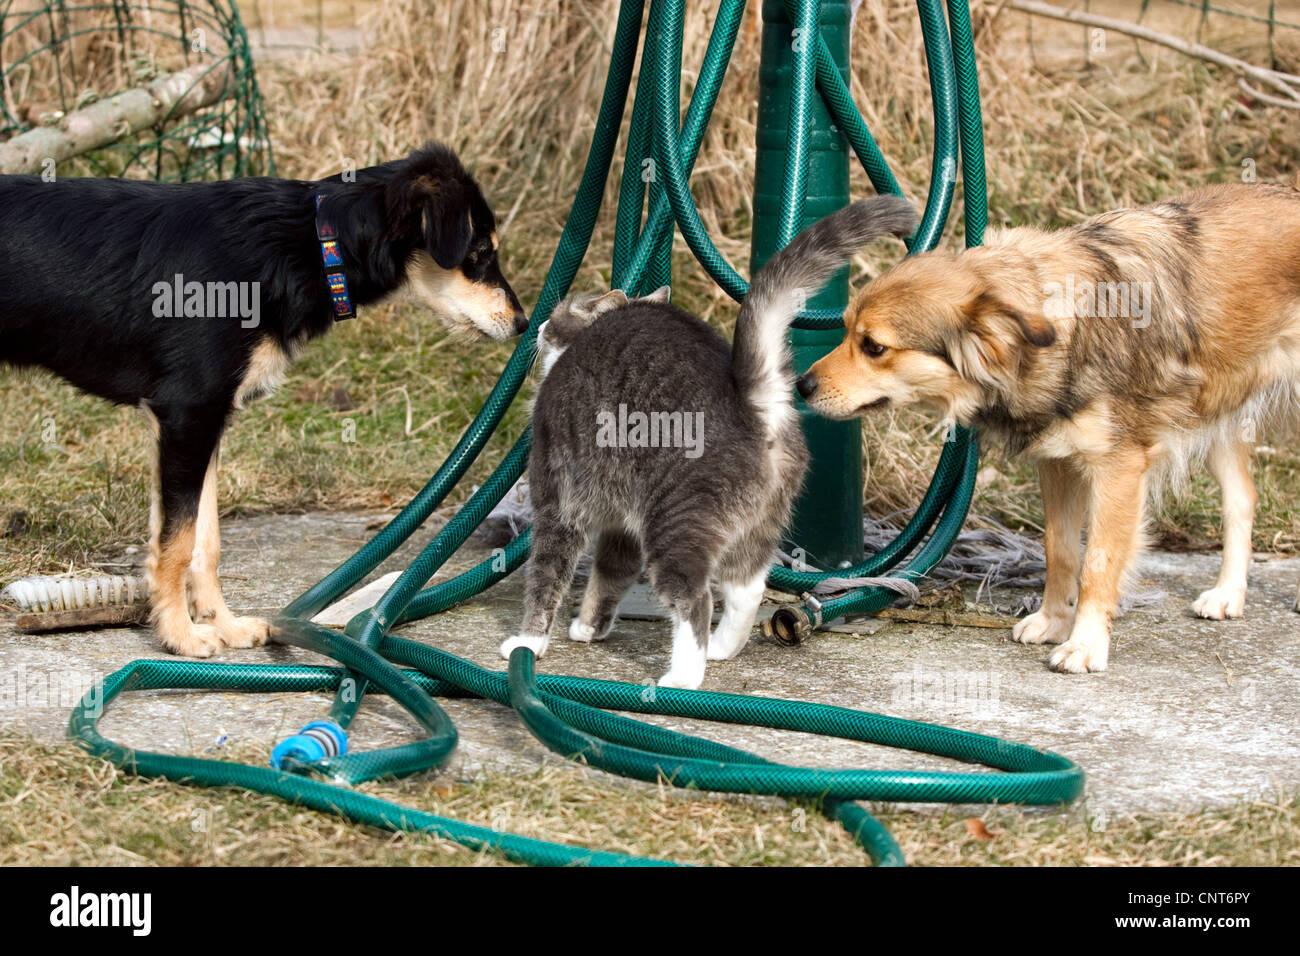 domestic cat, house cat (Felis silvestris f. catus), two dogs surrounding a cat Stock Photo